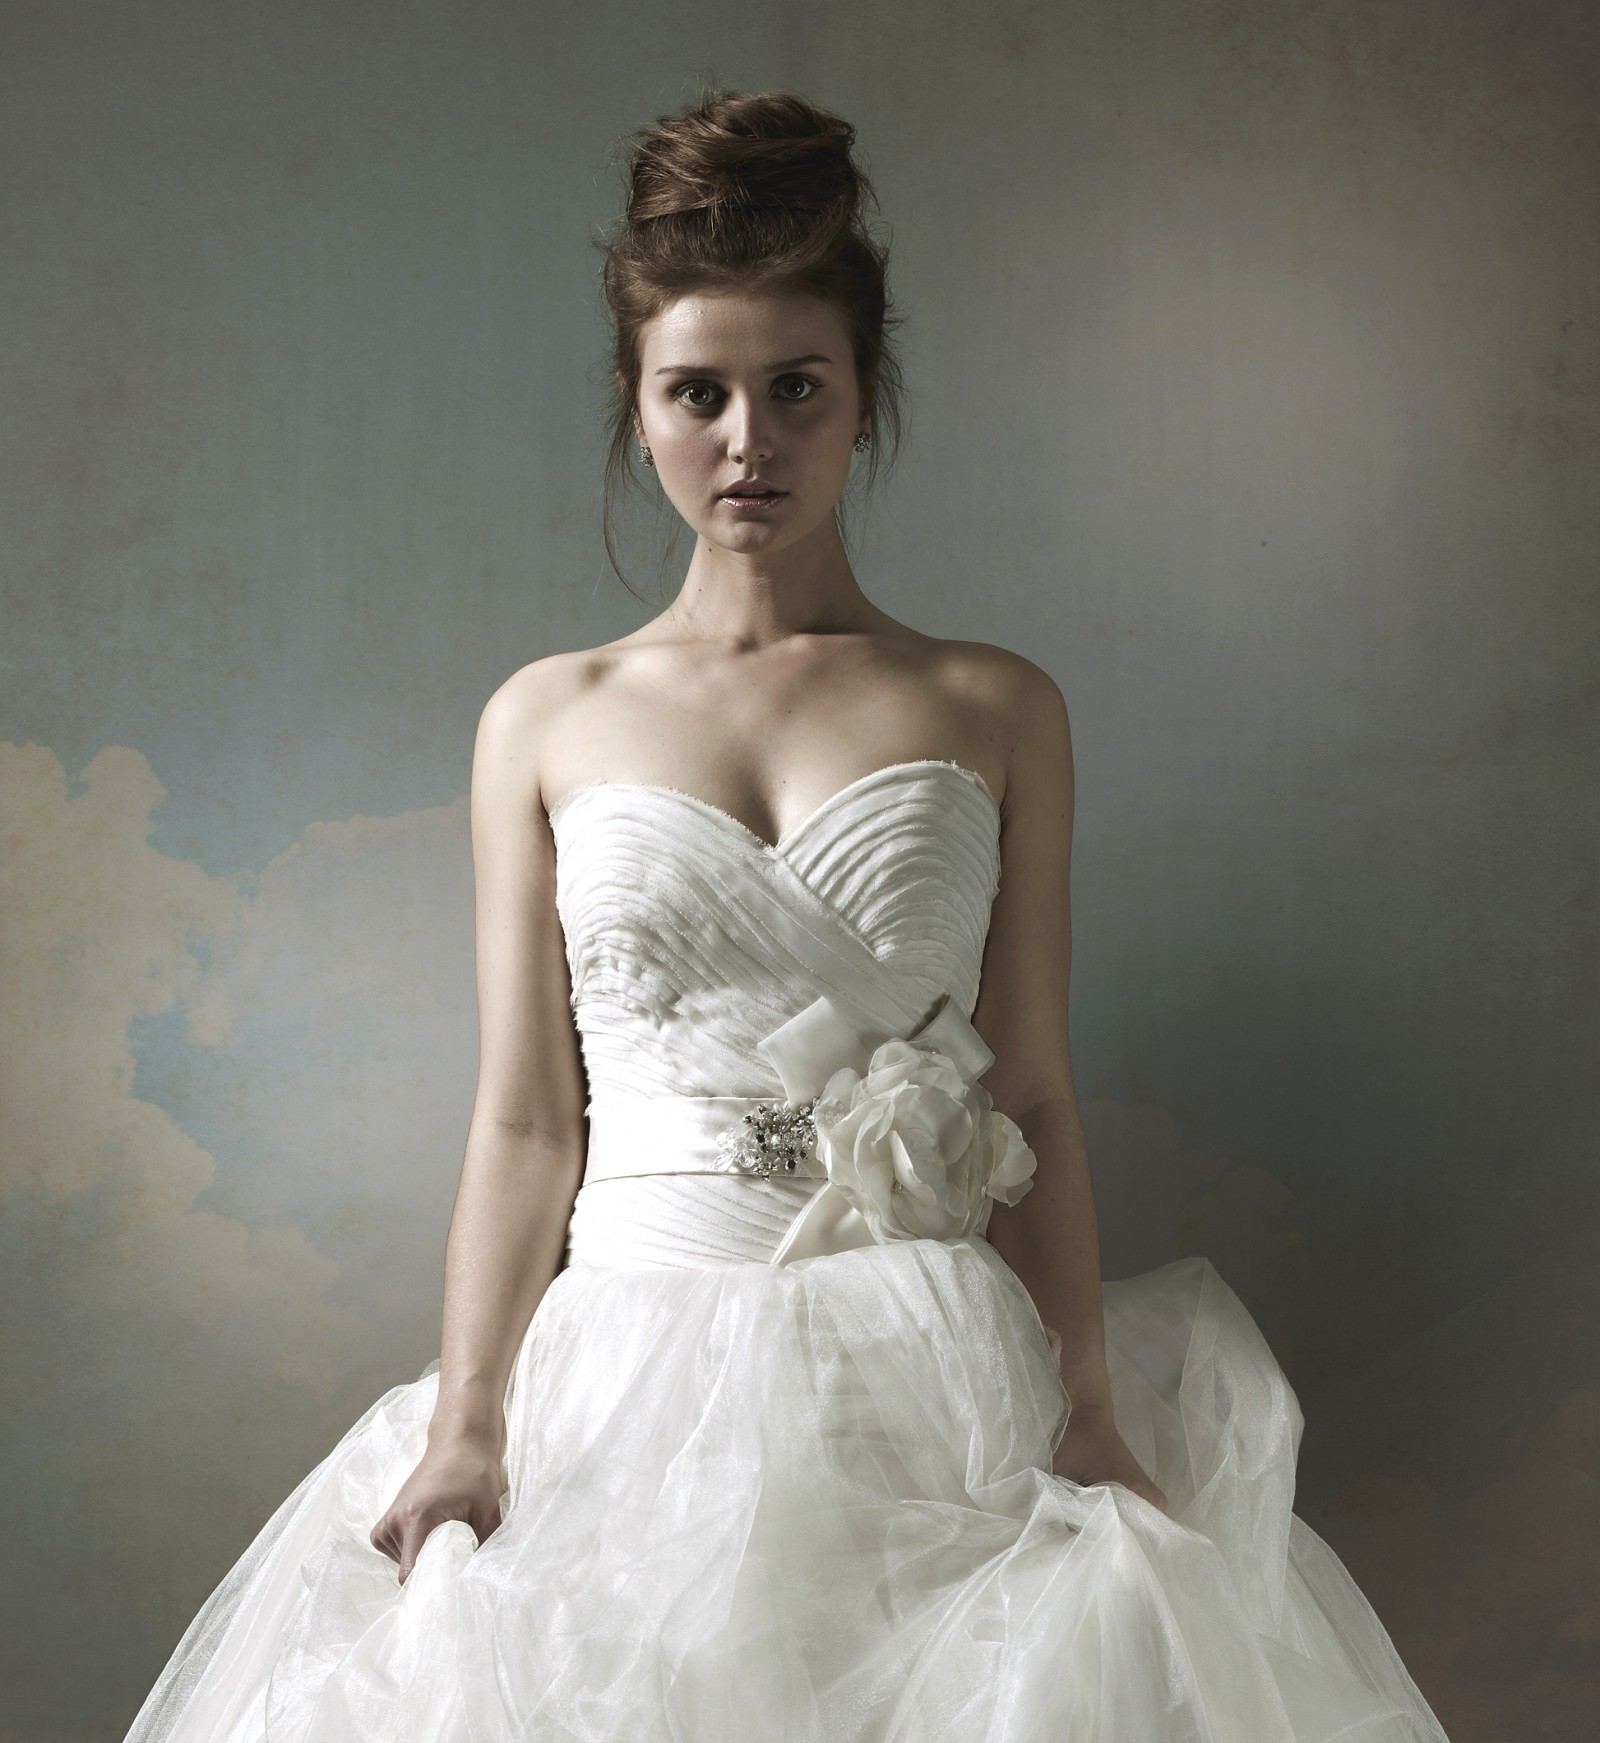 White Wedding Dress Nz: Fiorenza Elizabeth New Wedding Dress On Sale 82% Off